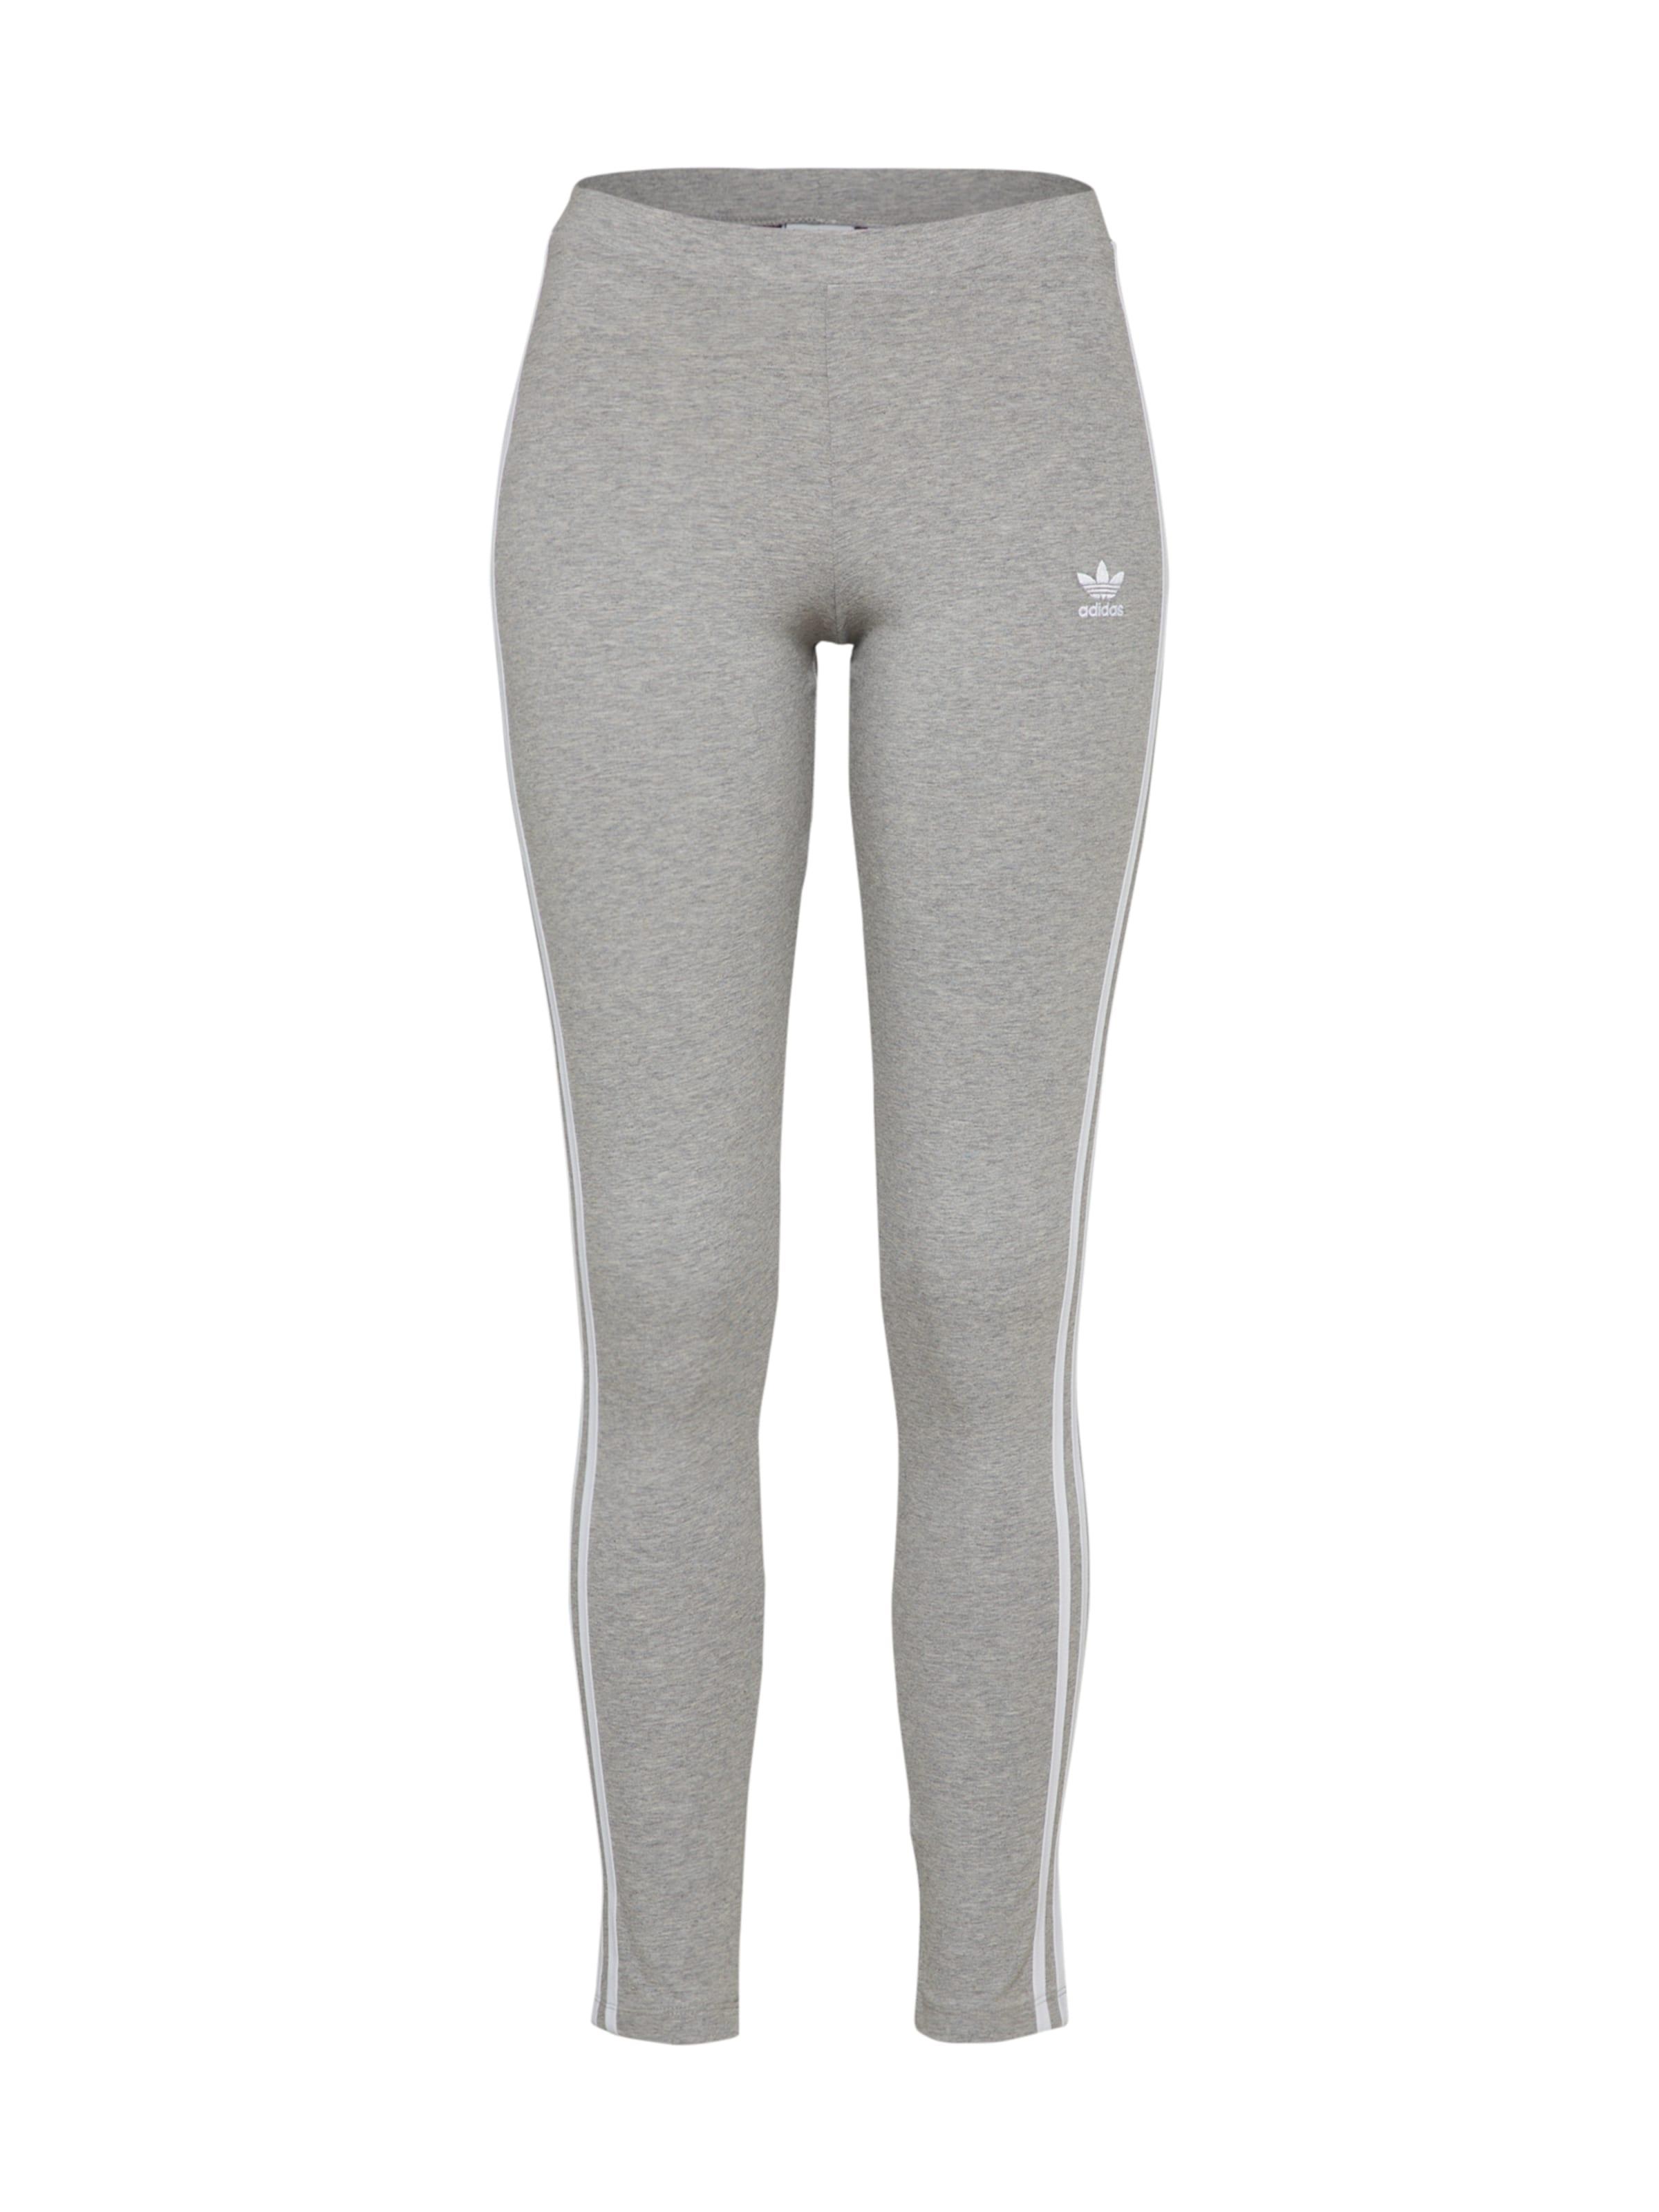 In Stripes' Adidas '3 Originals Leggings GraumeliertWeiß hdQsrtC